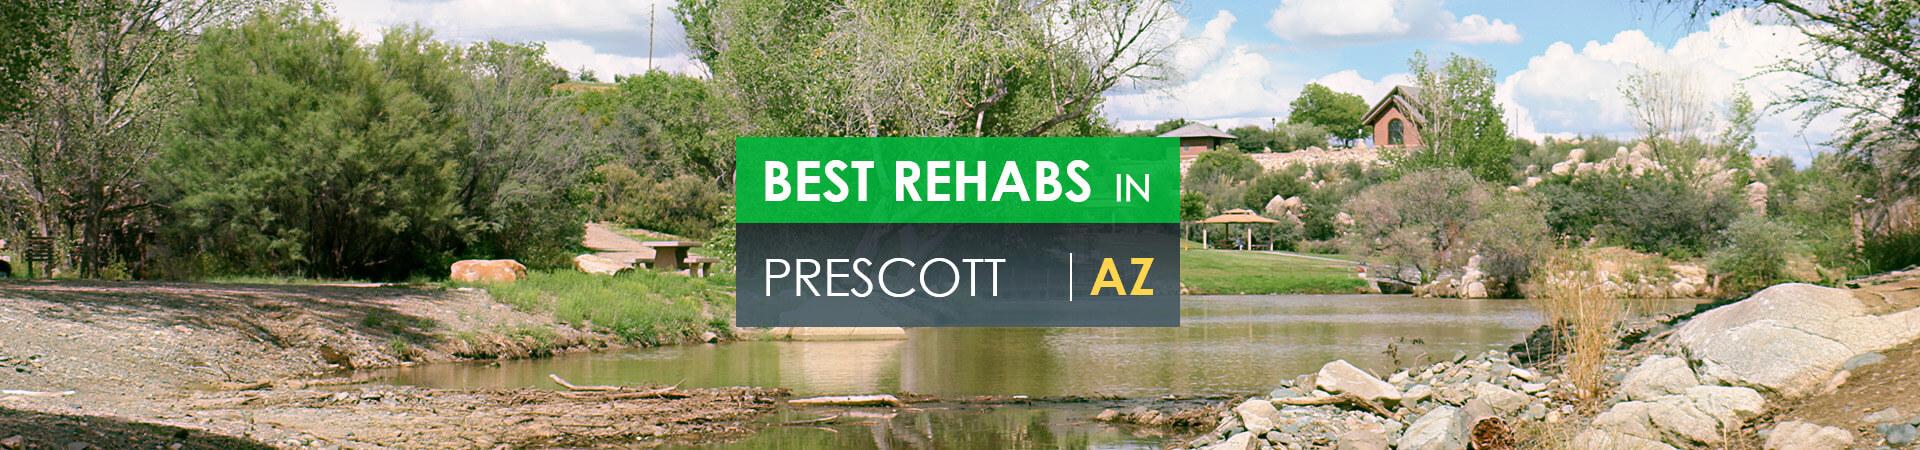 Best rehabs in Prescott, AZ